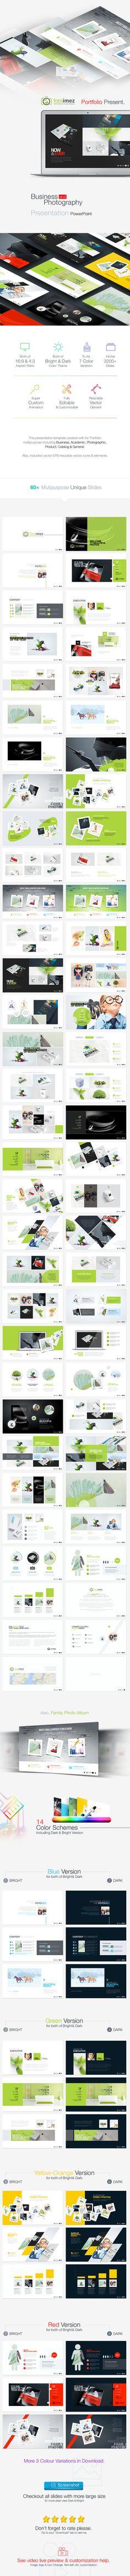 FotoImez | Portfolio Multipurpose Presentation Template #powerpoint #powerpointtemplate Download: http://graphicriver.net/item/fotoimez-portfolio-multipurpose-presentation/10310382?ref=ksioks